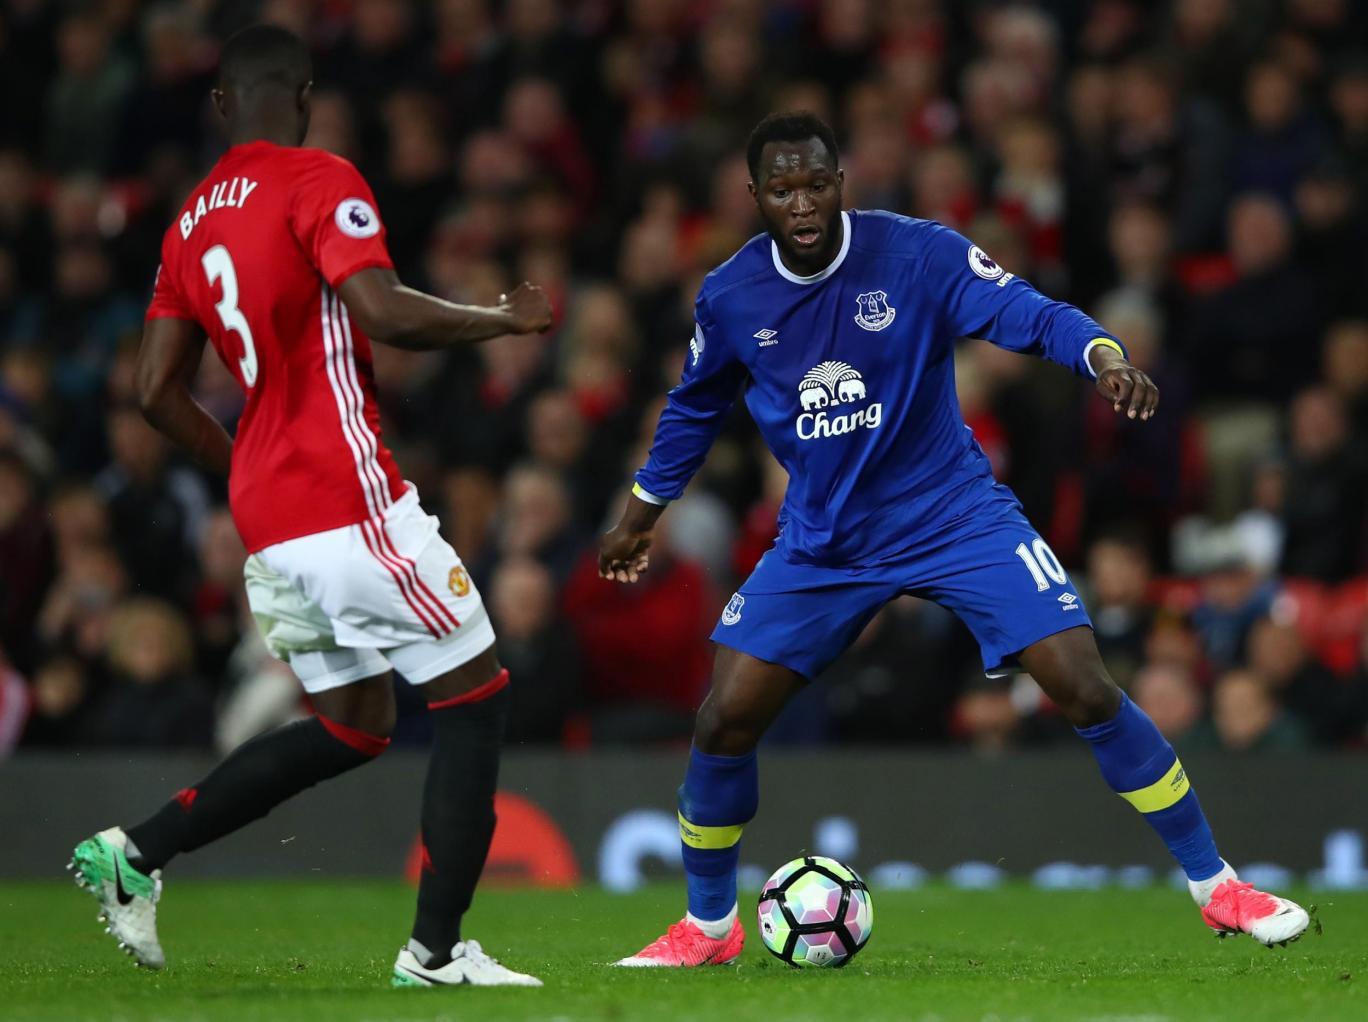 Mourinho signed Lukaku to stop Chelsea getting stronger: Phil Neville